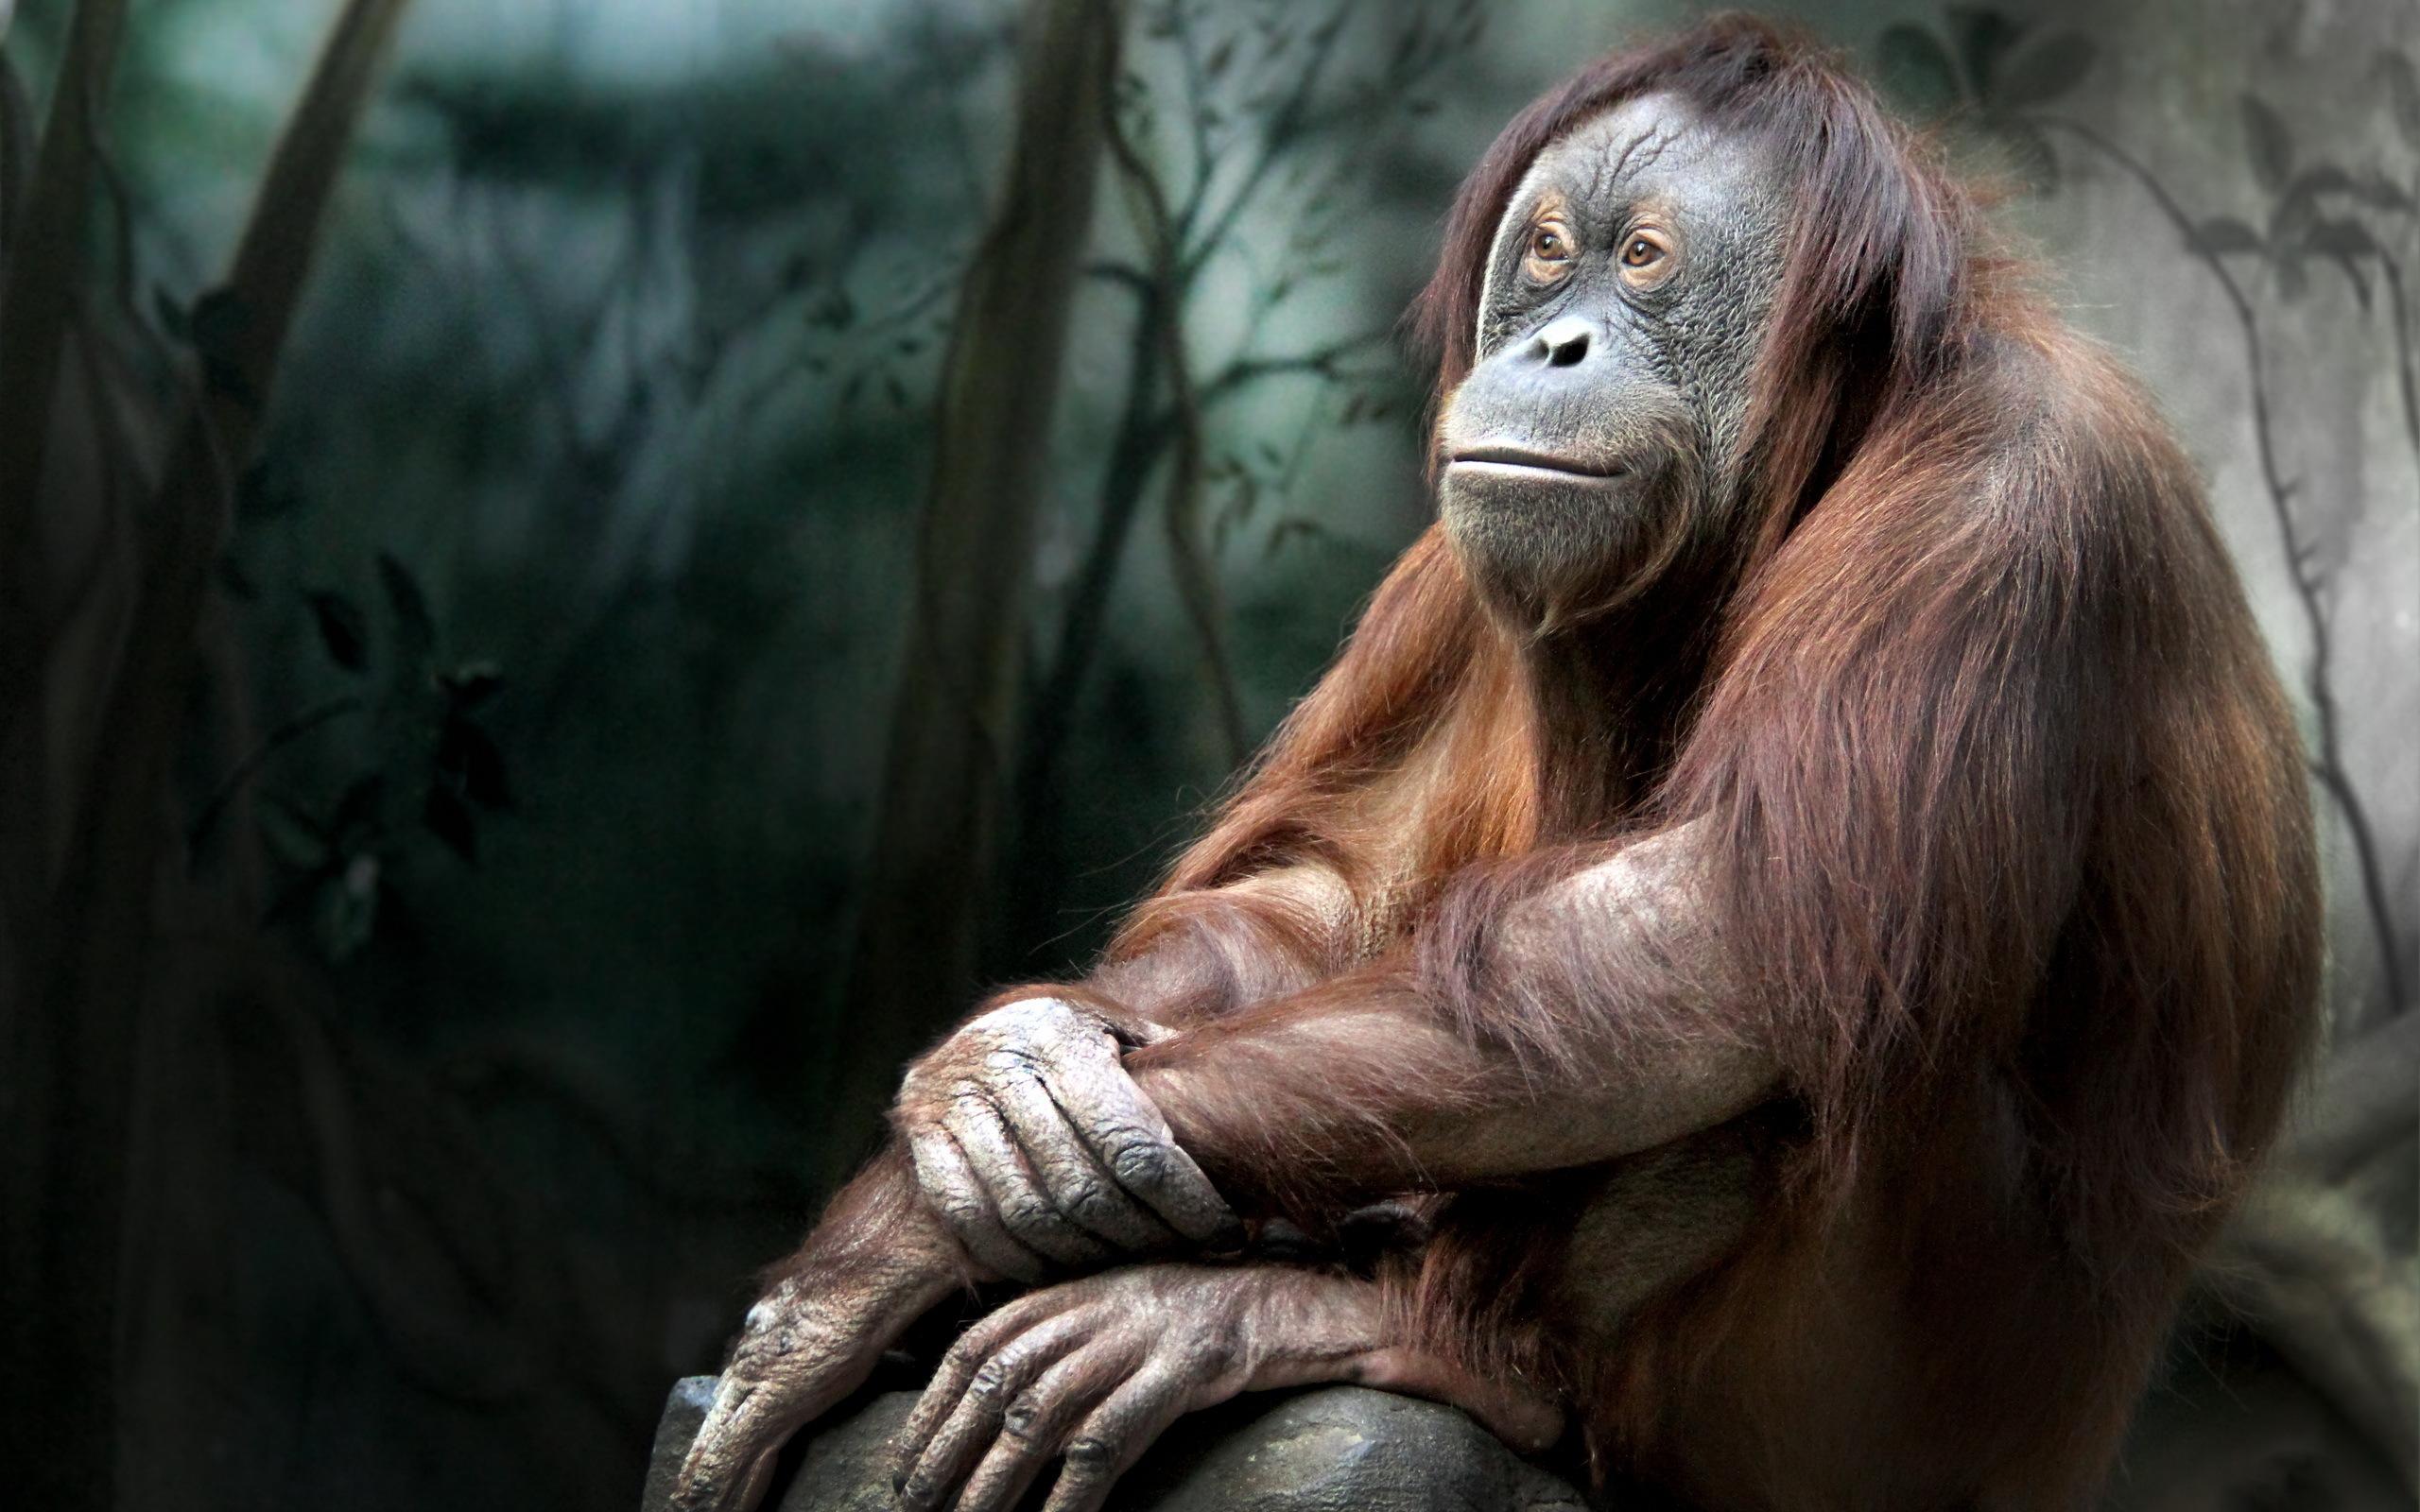 Orangutan Hd Wallpaper Background Image 2560x1600 Id590443